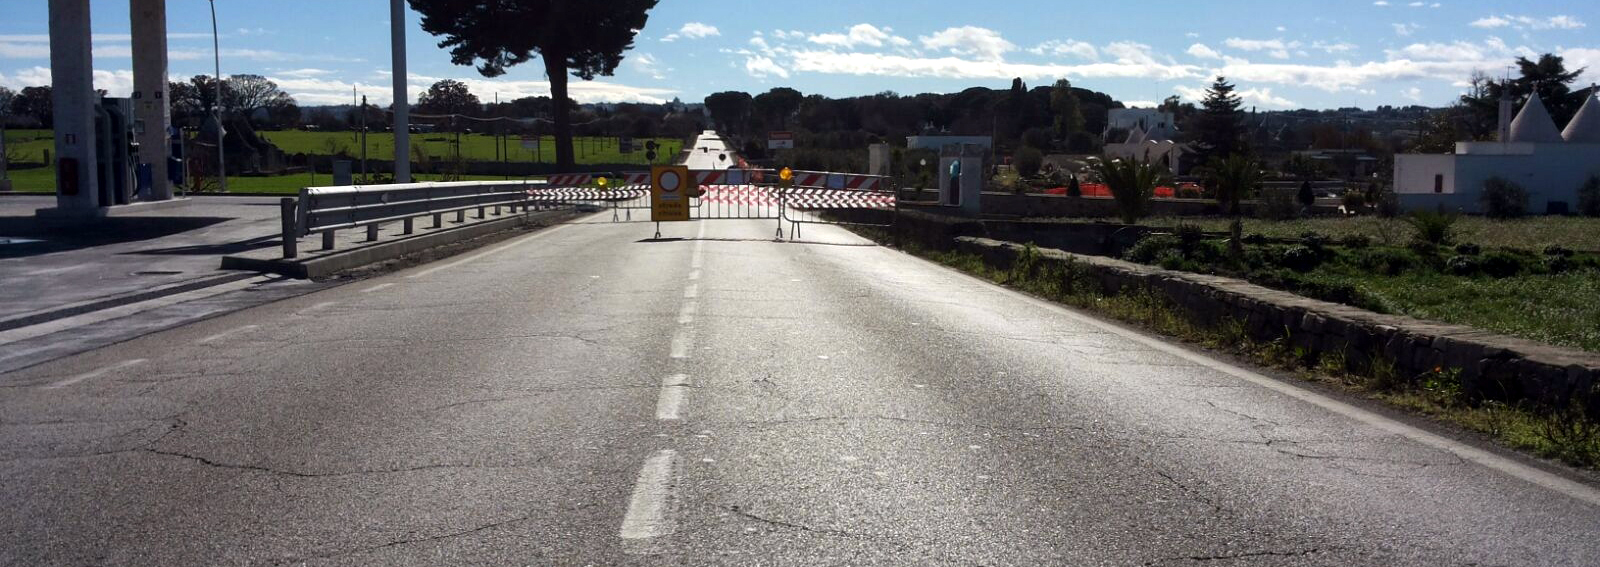 strada statale 172 martina franca locorotondo transenne 11